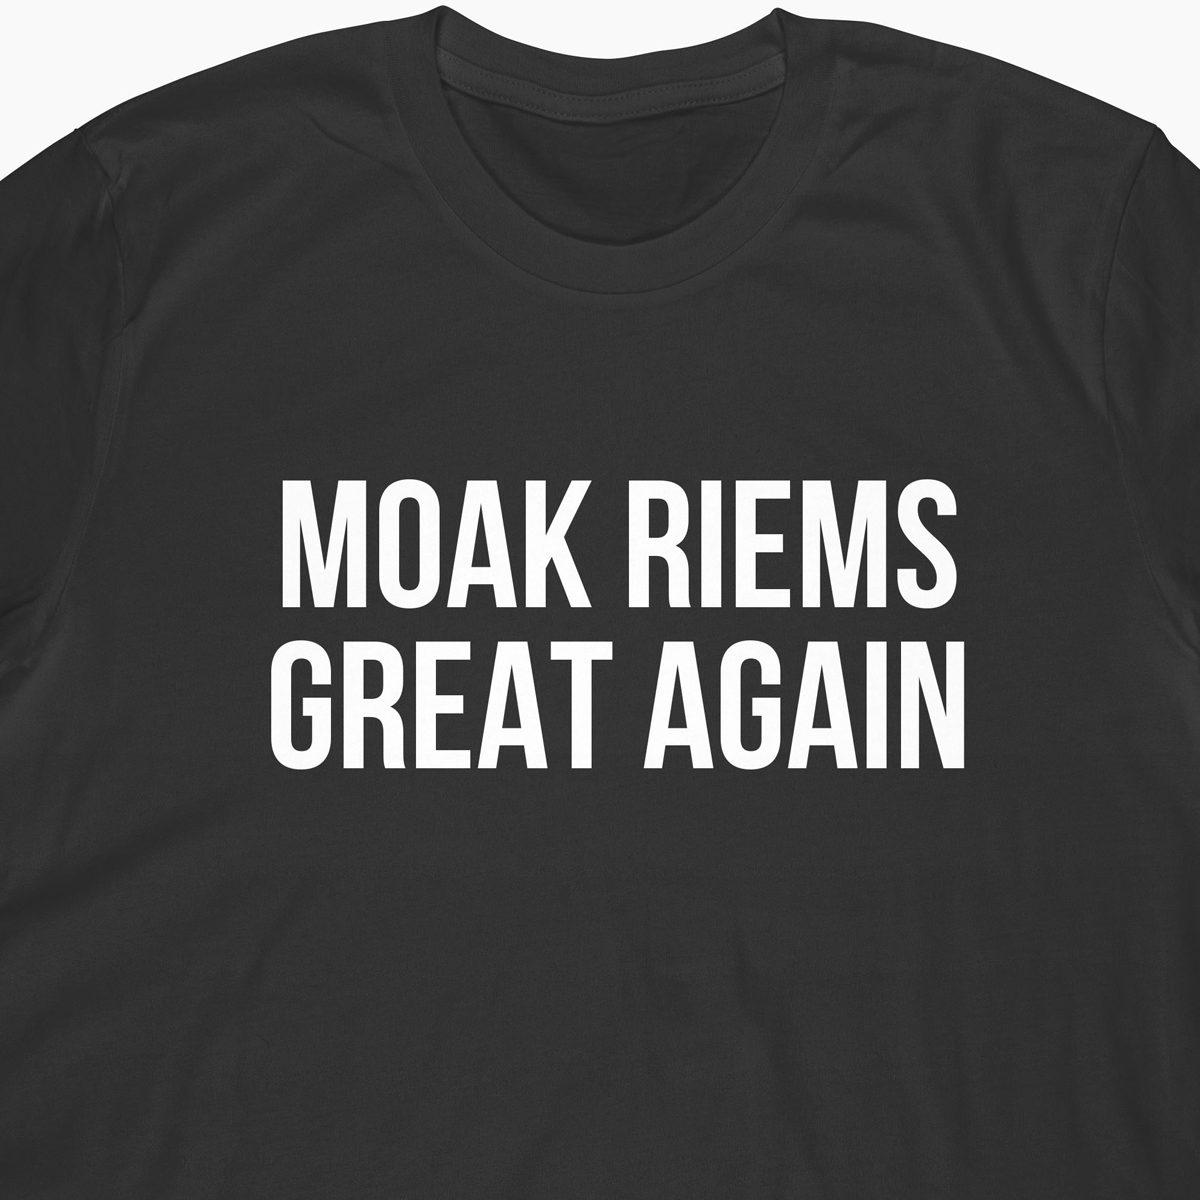 shop webshop webwinkel unieke shirts dialect shirts van riemst moak riems great again shirt mcsnooze custom shirt riemst